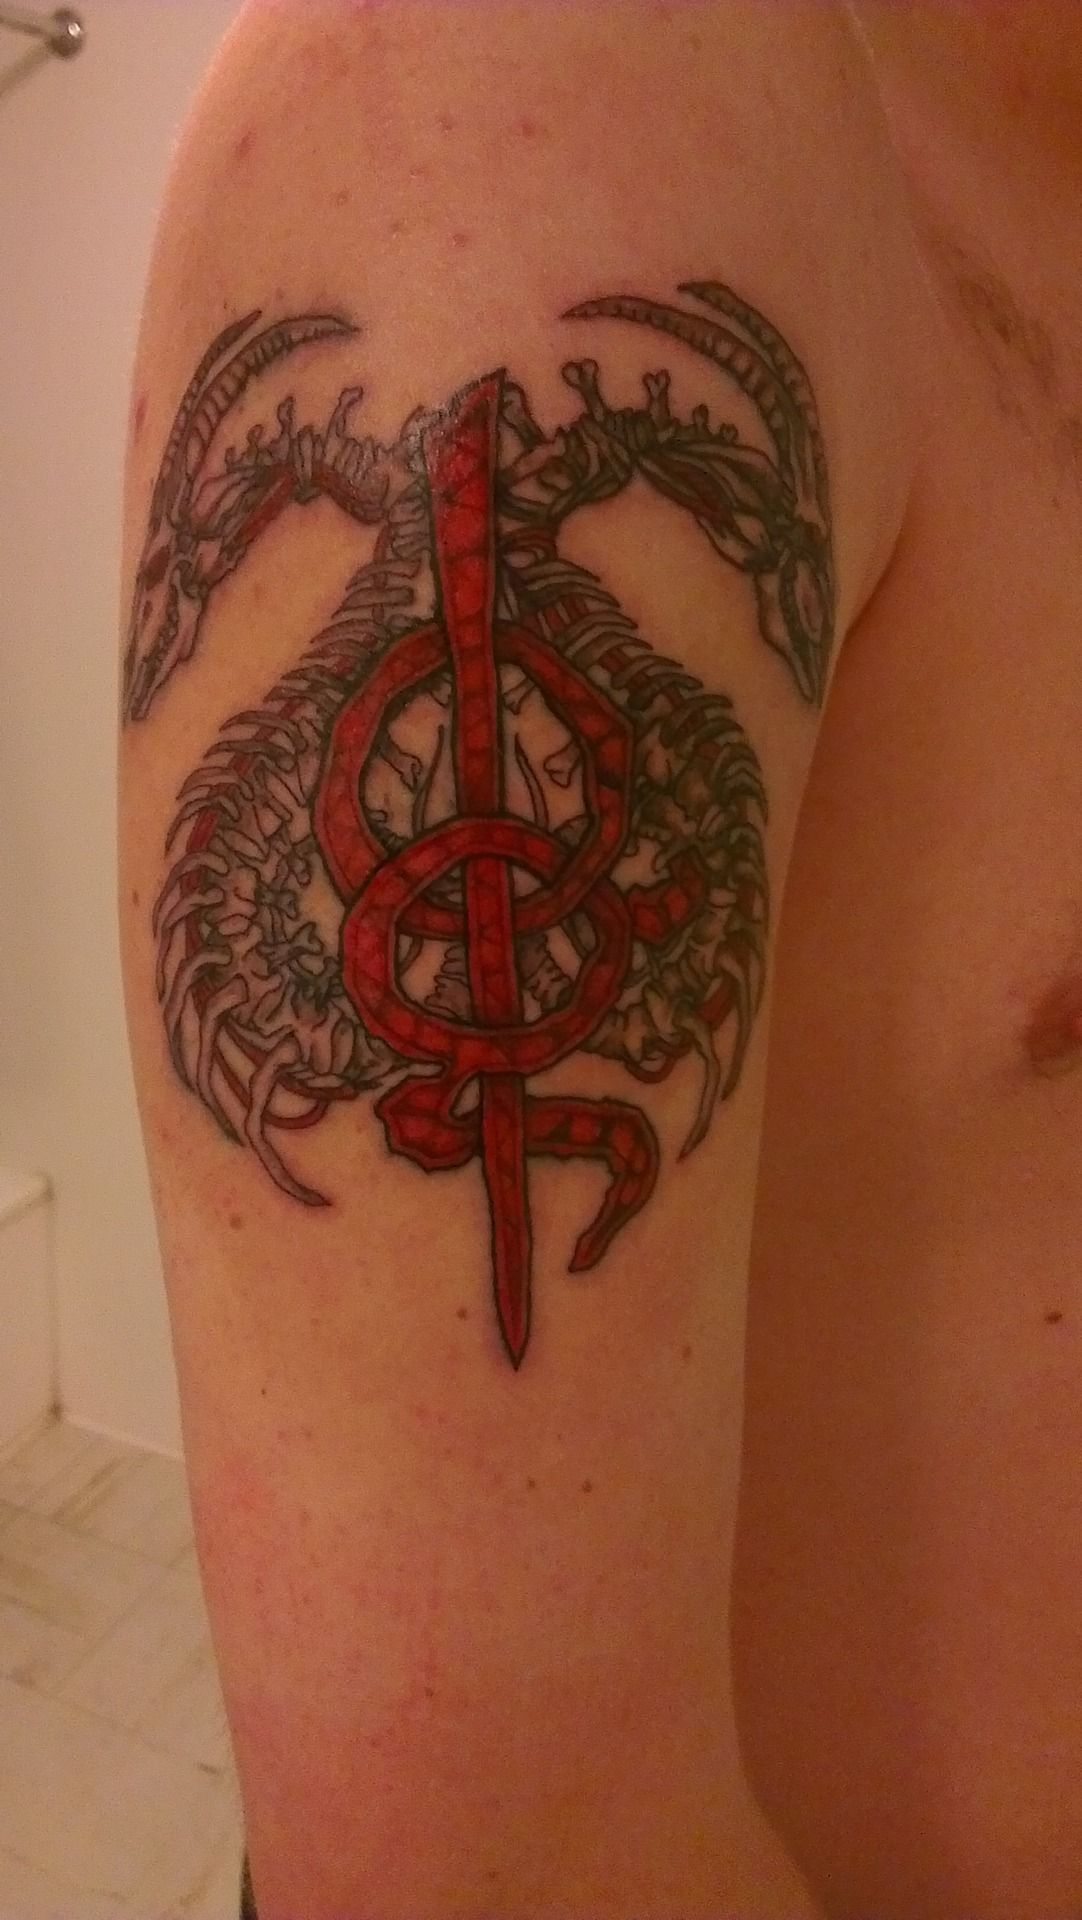 Lamb of god tattoos